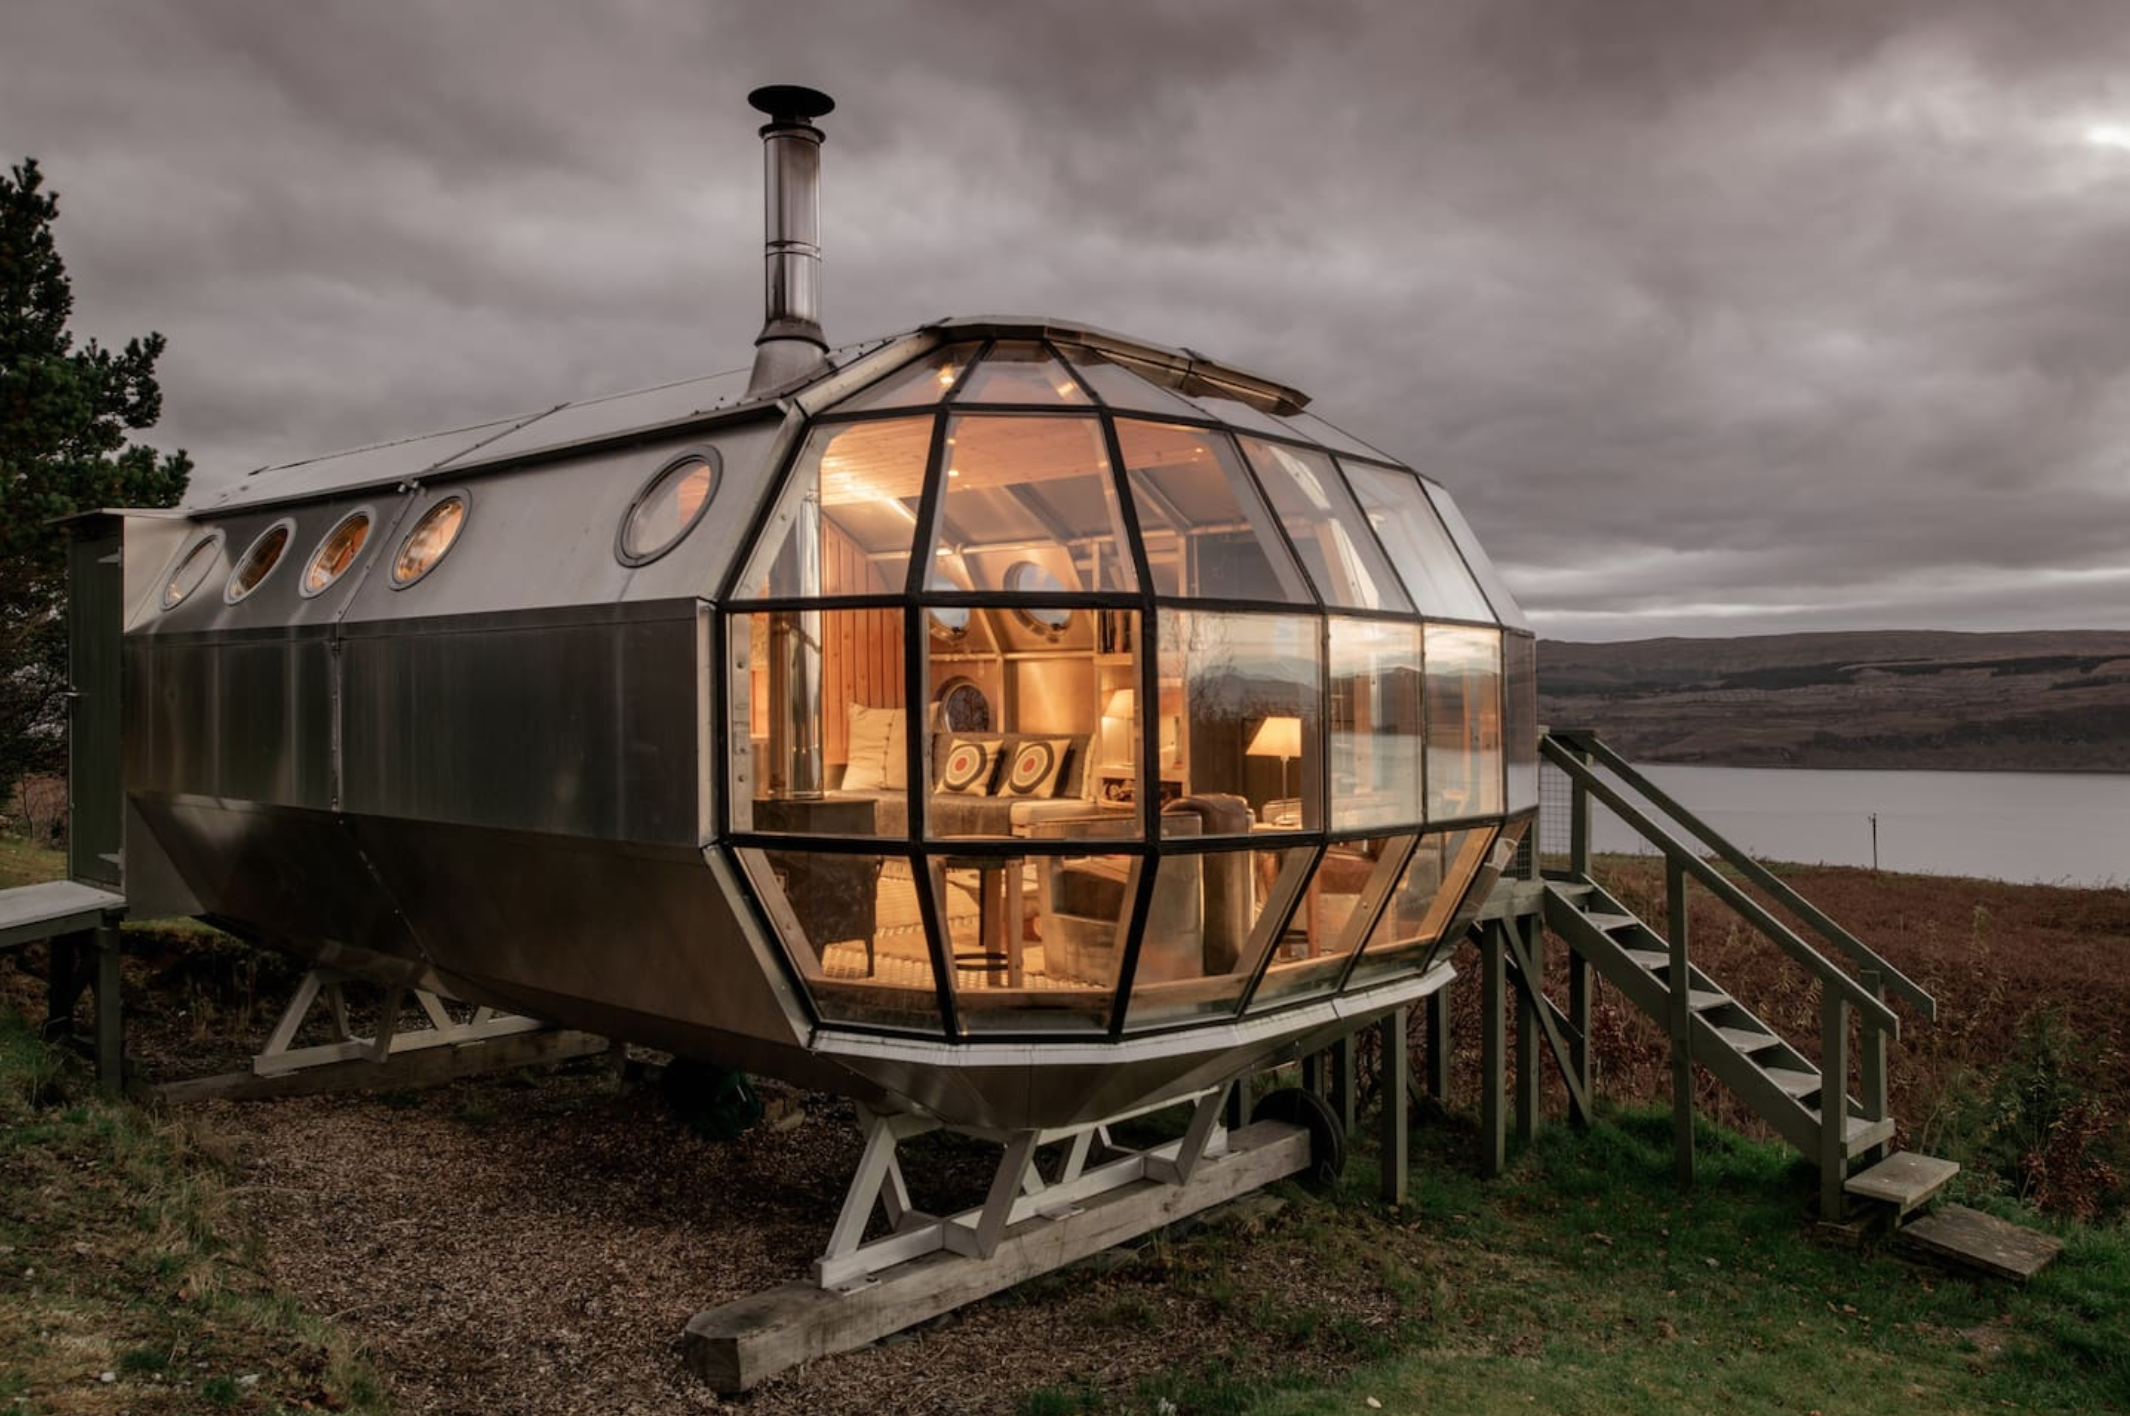 Unique Accommodation Airship 002